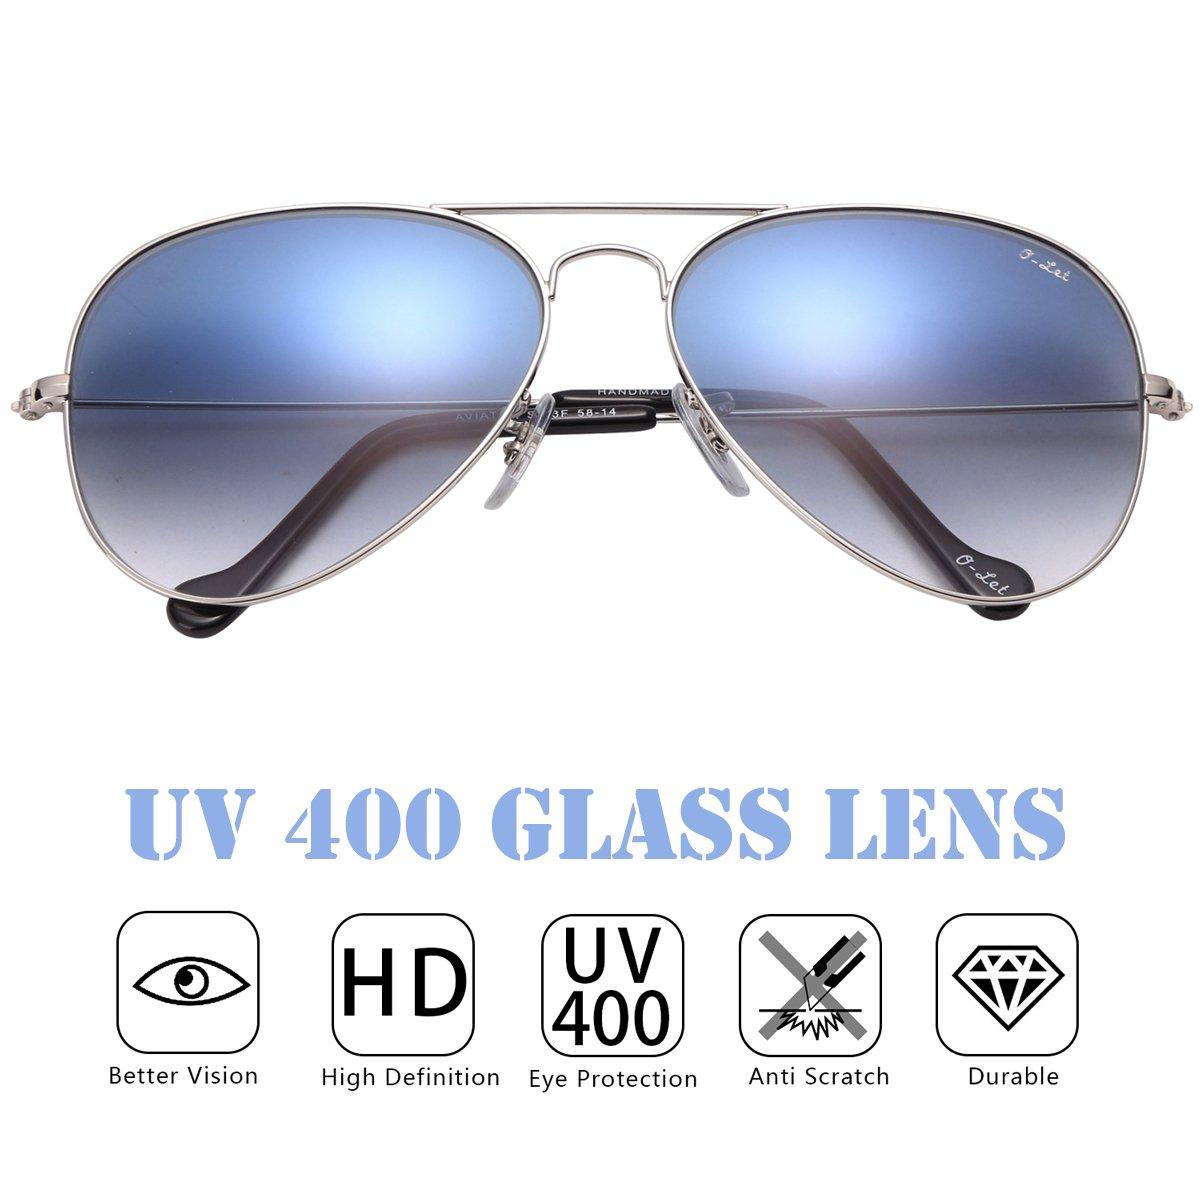 O-LET Small Aviator Sunglasses Women Men Aviators UV400 with Gift Case 55mm (Silver Frame/Blue Gradient Lens, 55)